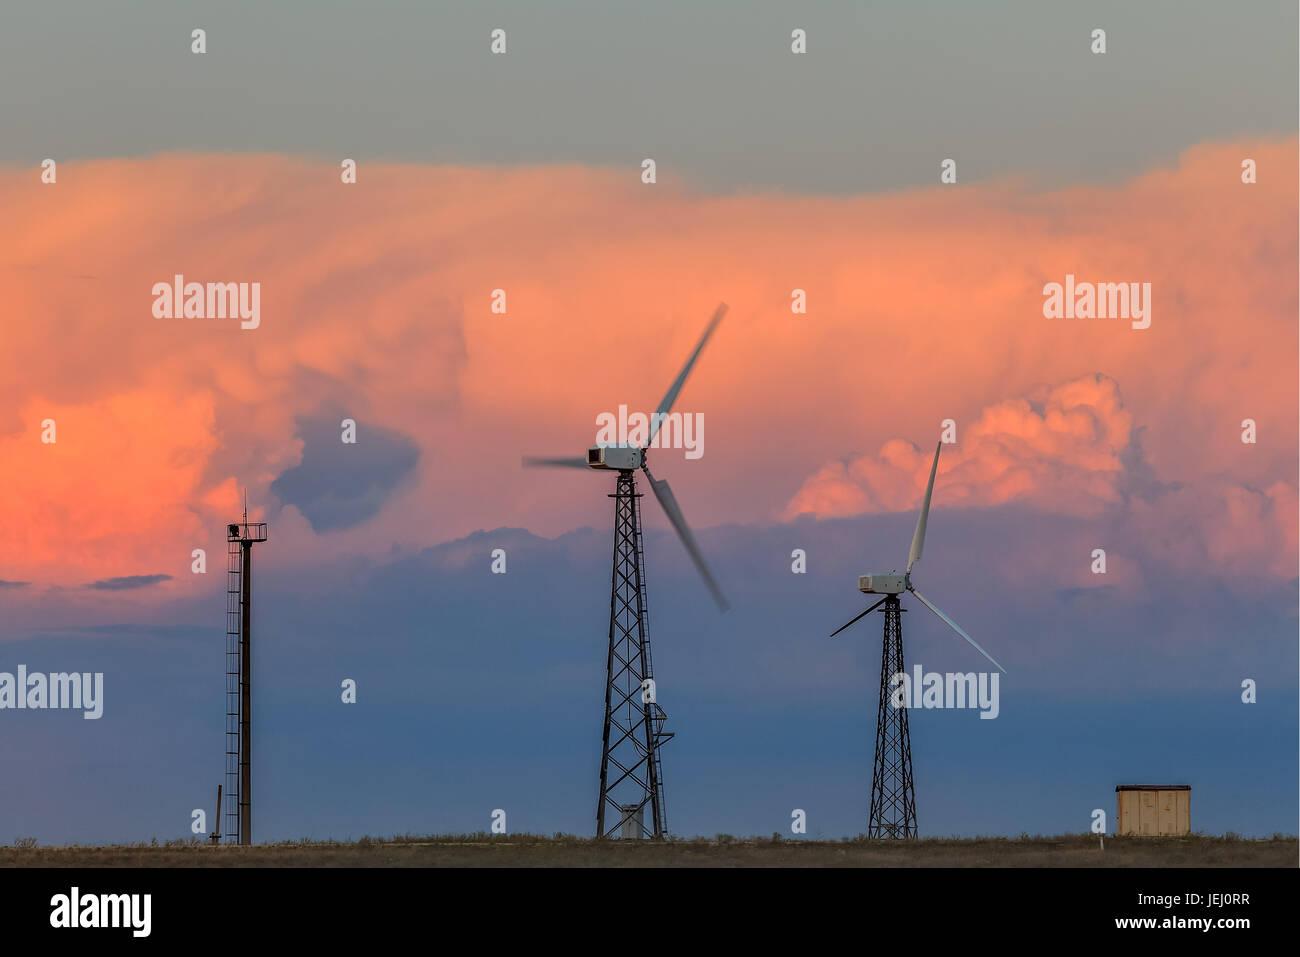 Alternative energy sources - Stock Image